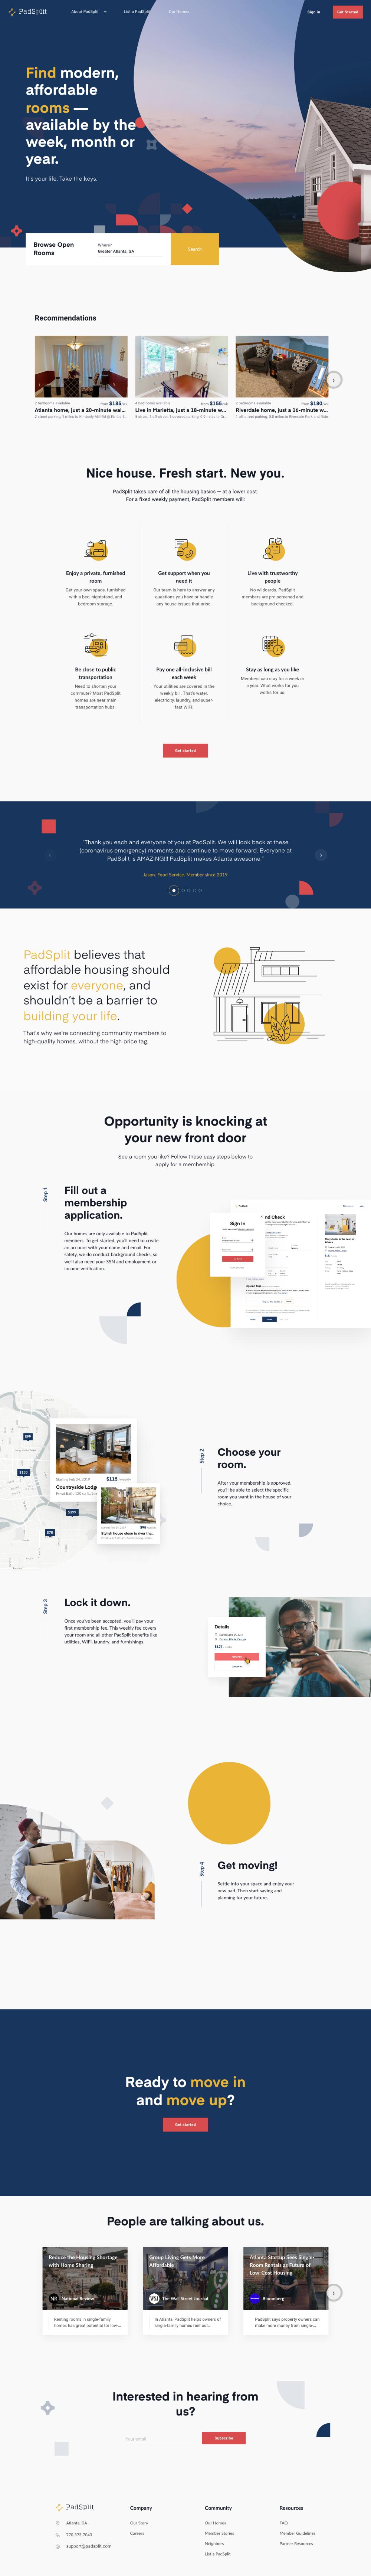 Padsplit Landing Page Design Inspiration Lapa Ninja In 2020 Landing Page Design Page Design Landing Page